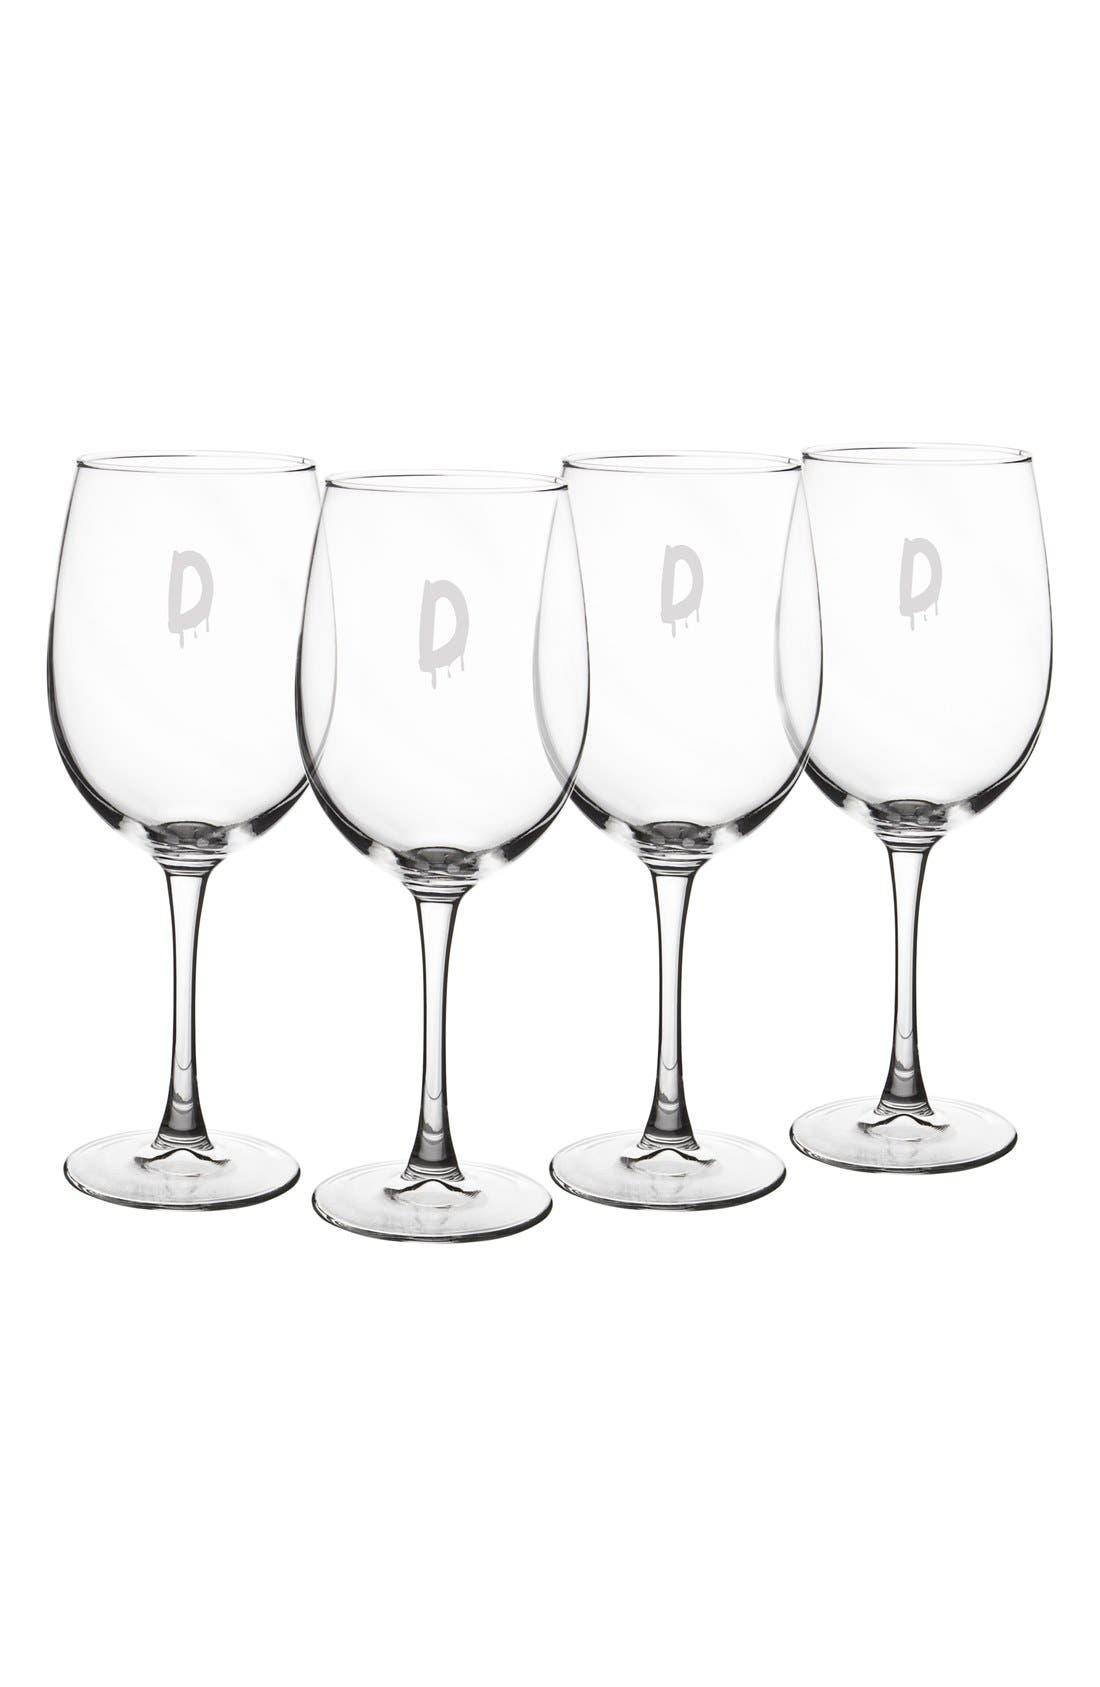 Cathy's Concepts Spooky Monogram Set of 4 White Wine Glasses